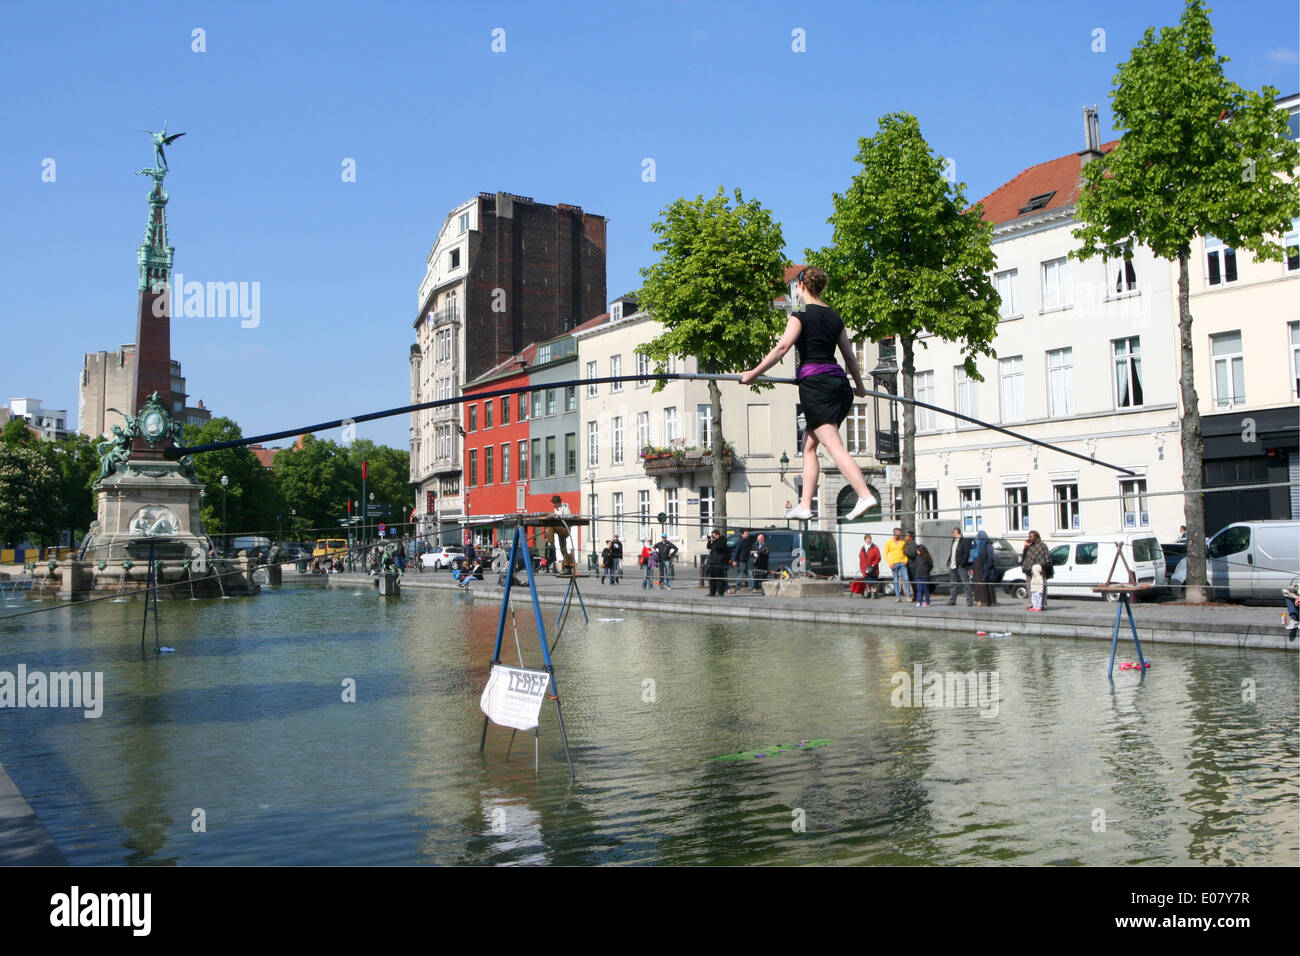 Tightrope walker in Brussels - Stock Image